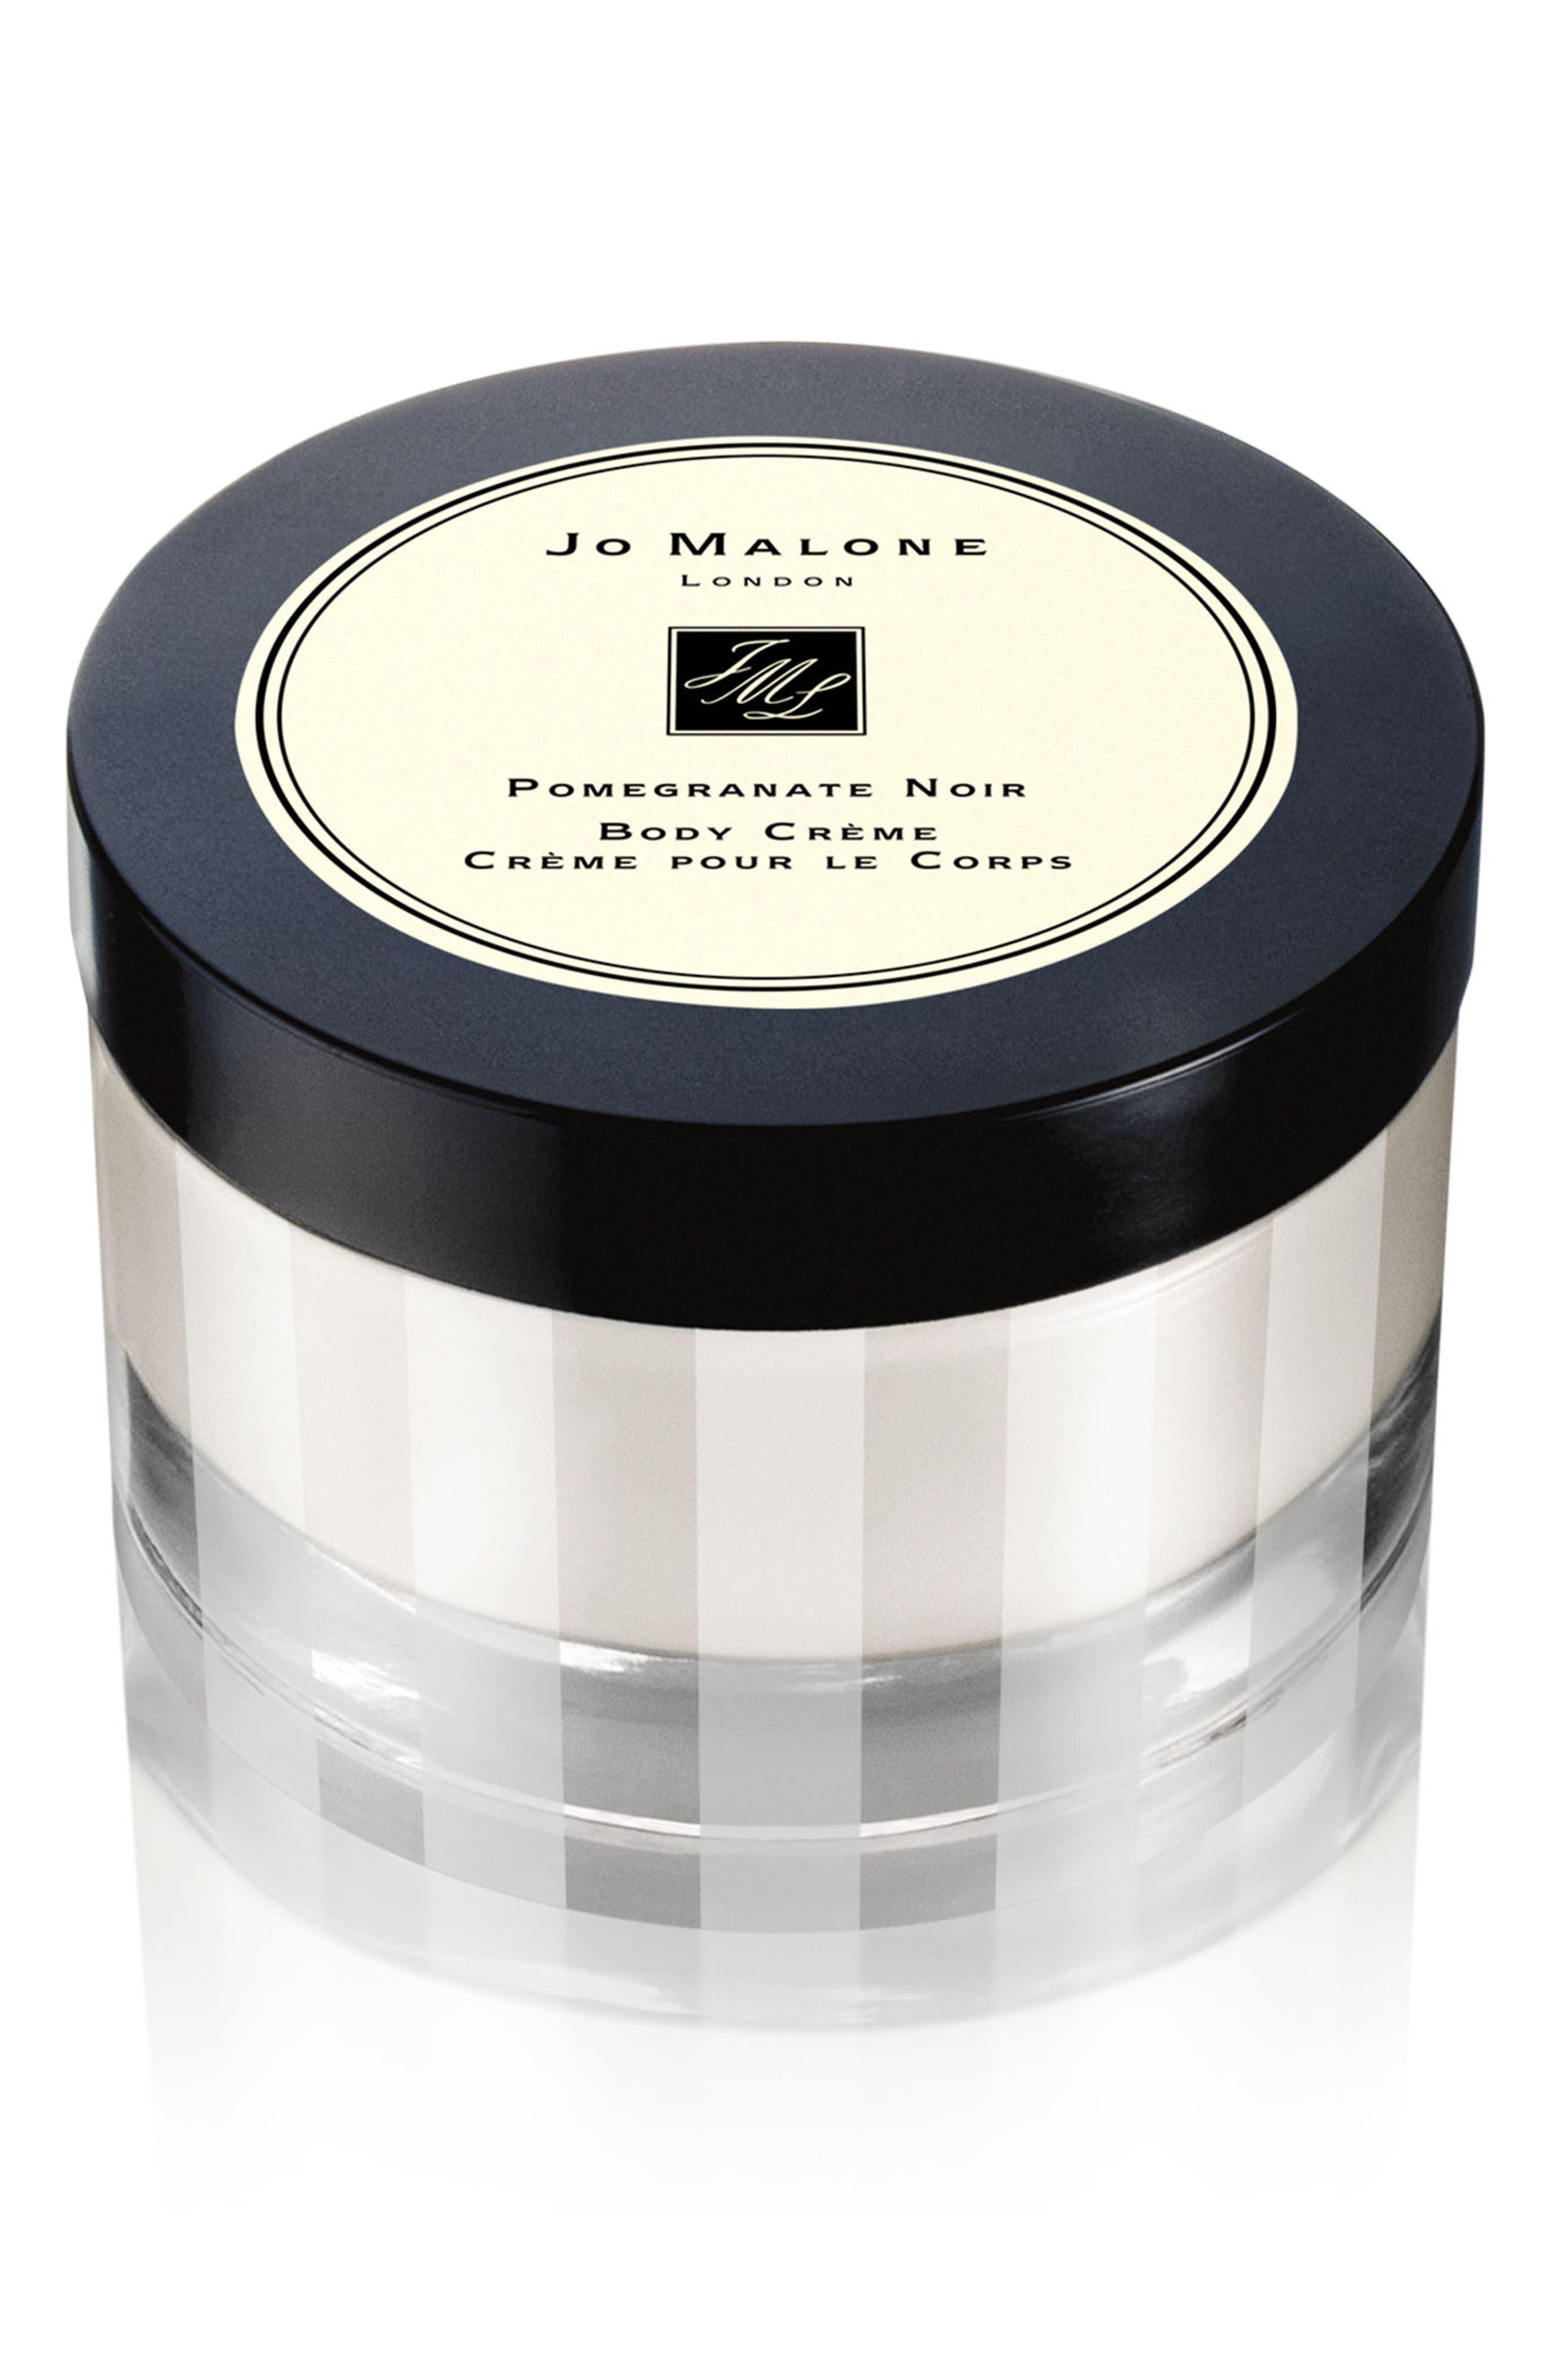 Alternate Image 1 Selected - Jo Malone London™ 'Pomegranate Noir' Body Crème